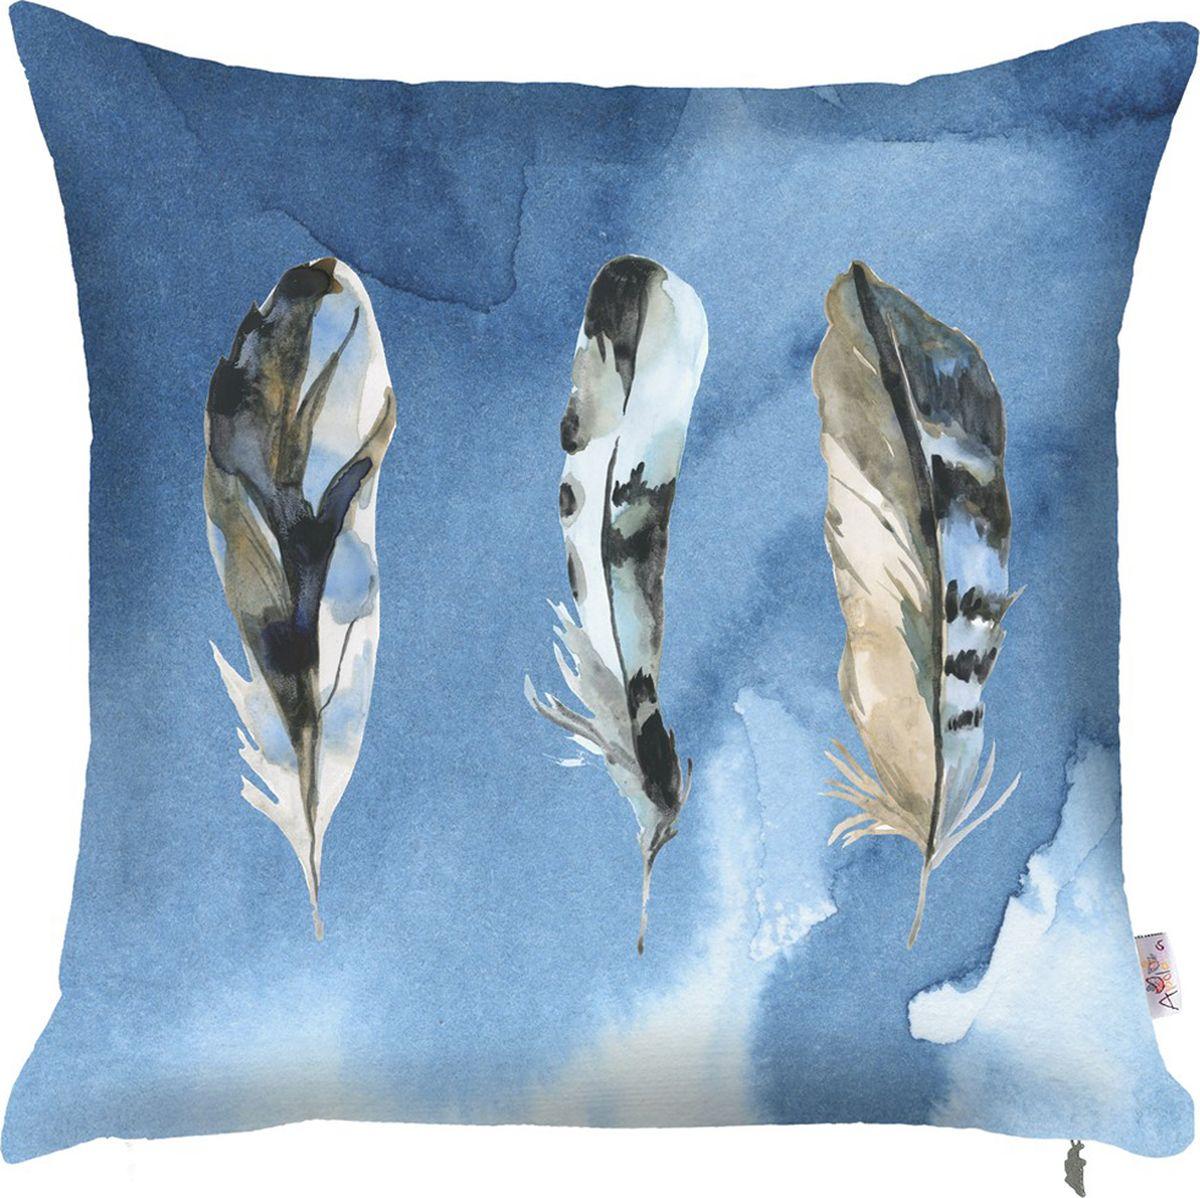 Чехол для декоративной подушки Apolena Blue collection, 43 х 43 см. P702-7911/1P702-7911/1